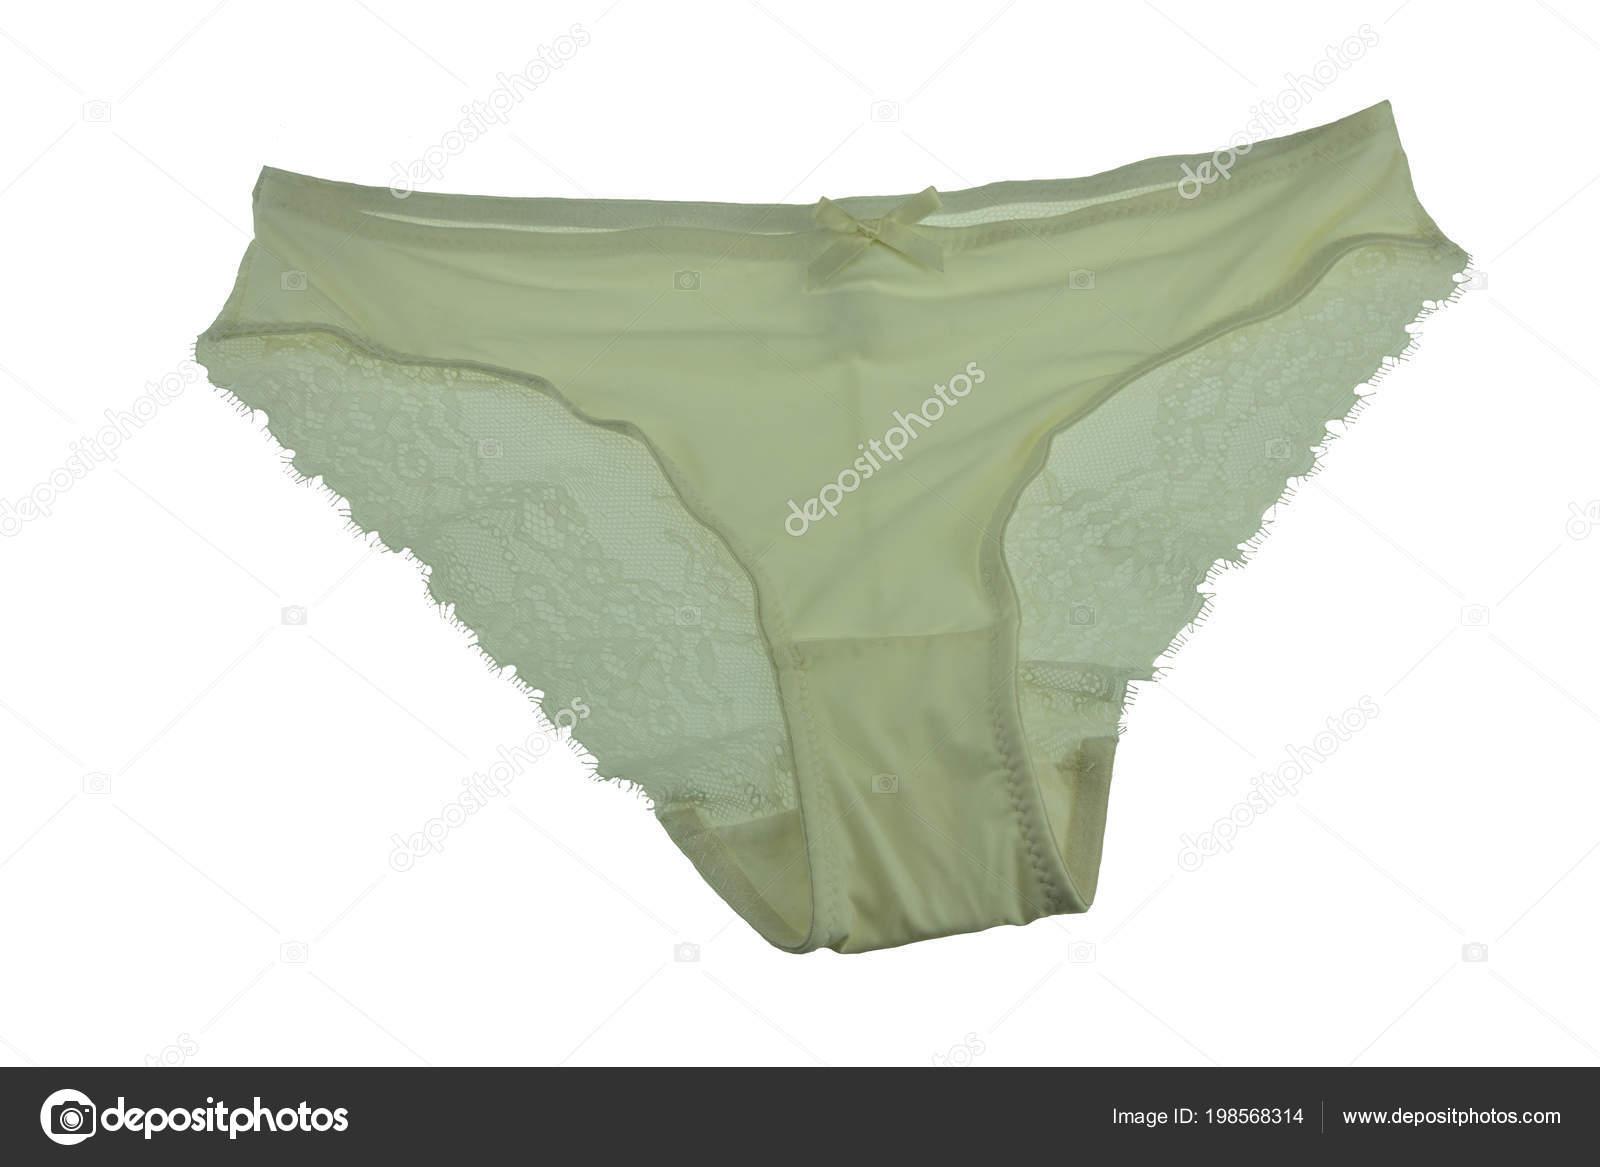 2457bf5c6 Calcinha Renda Seda Verde Isolada Fundo Branco Cueca Verde — Fotografia de  Stock